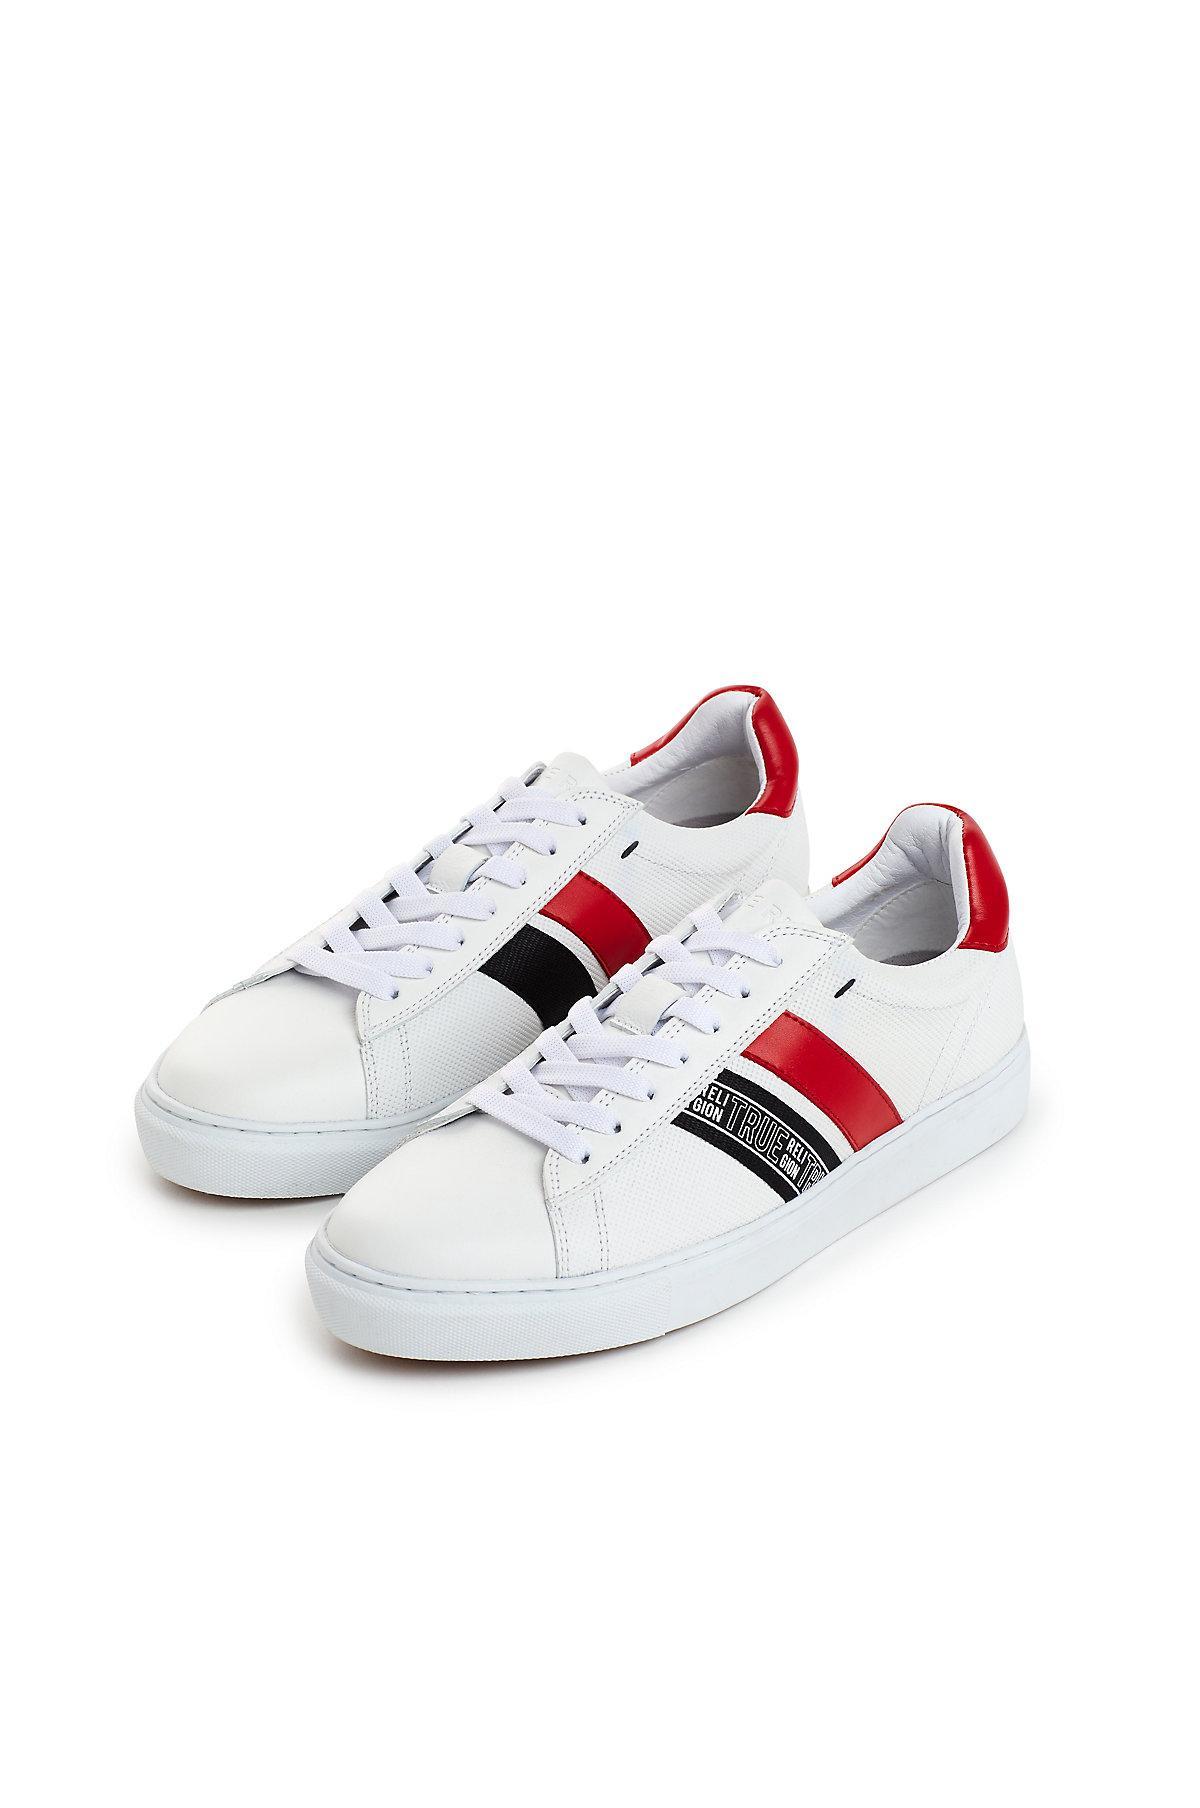 True Religion Leather Amaro Sneaker in